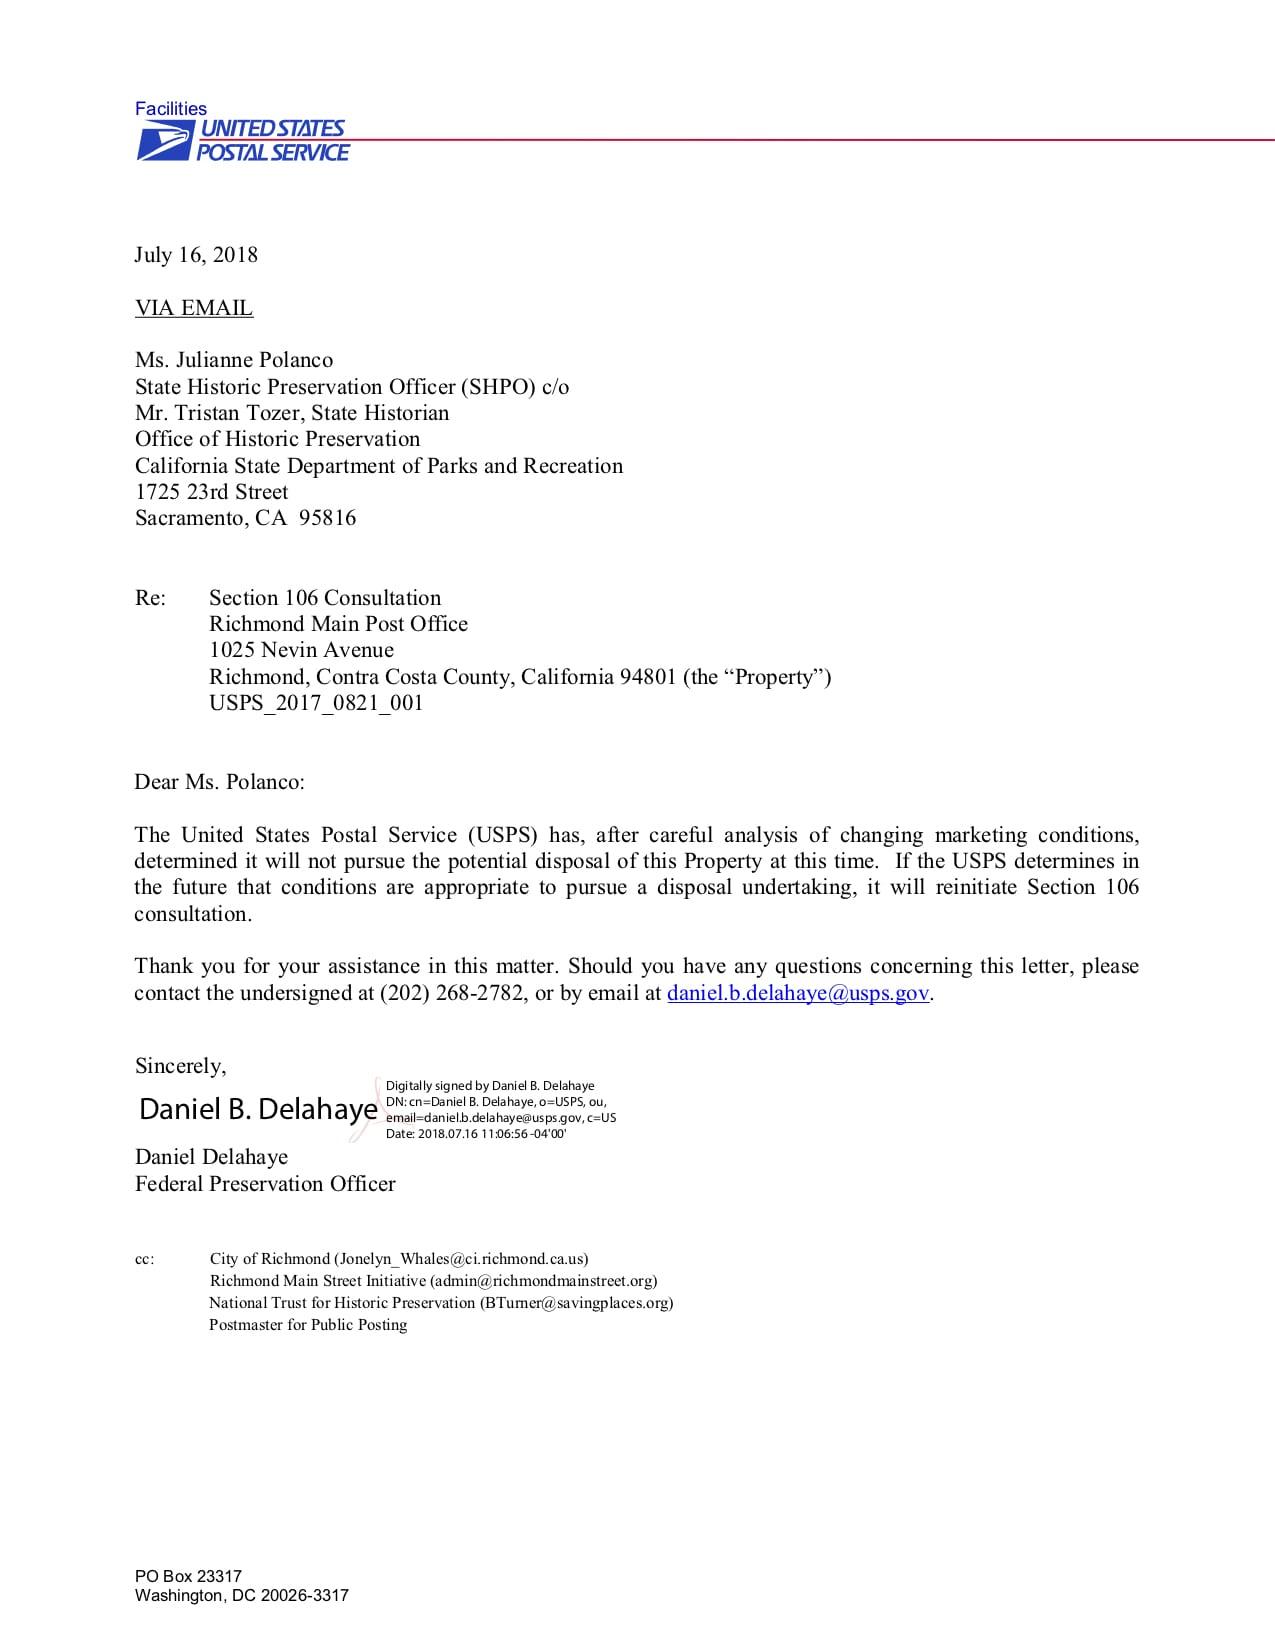 USPS letter to SHPO July 16, 2018